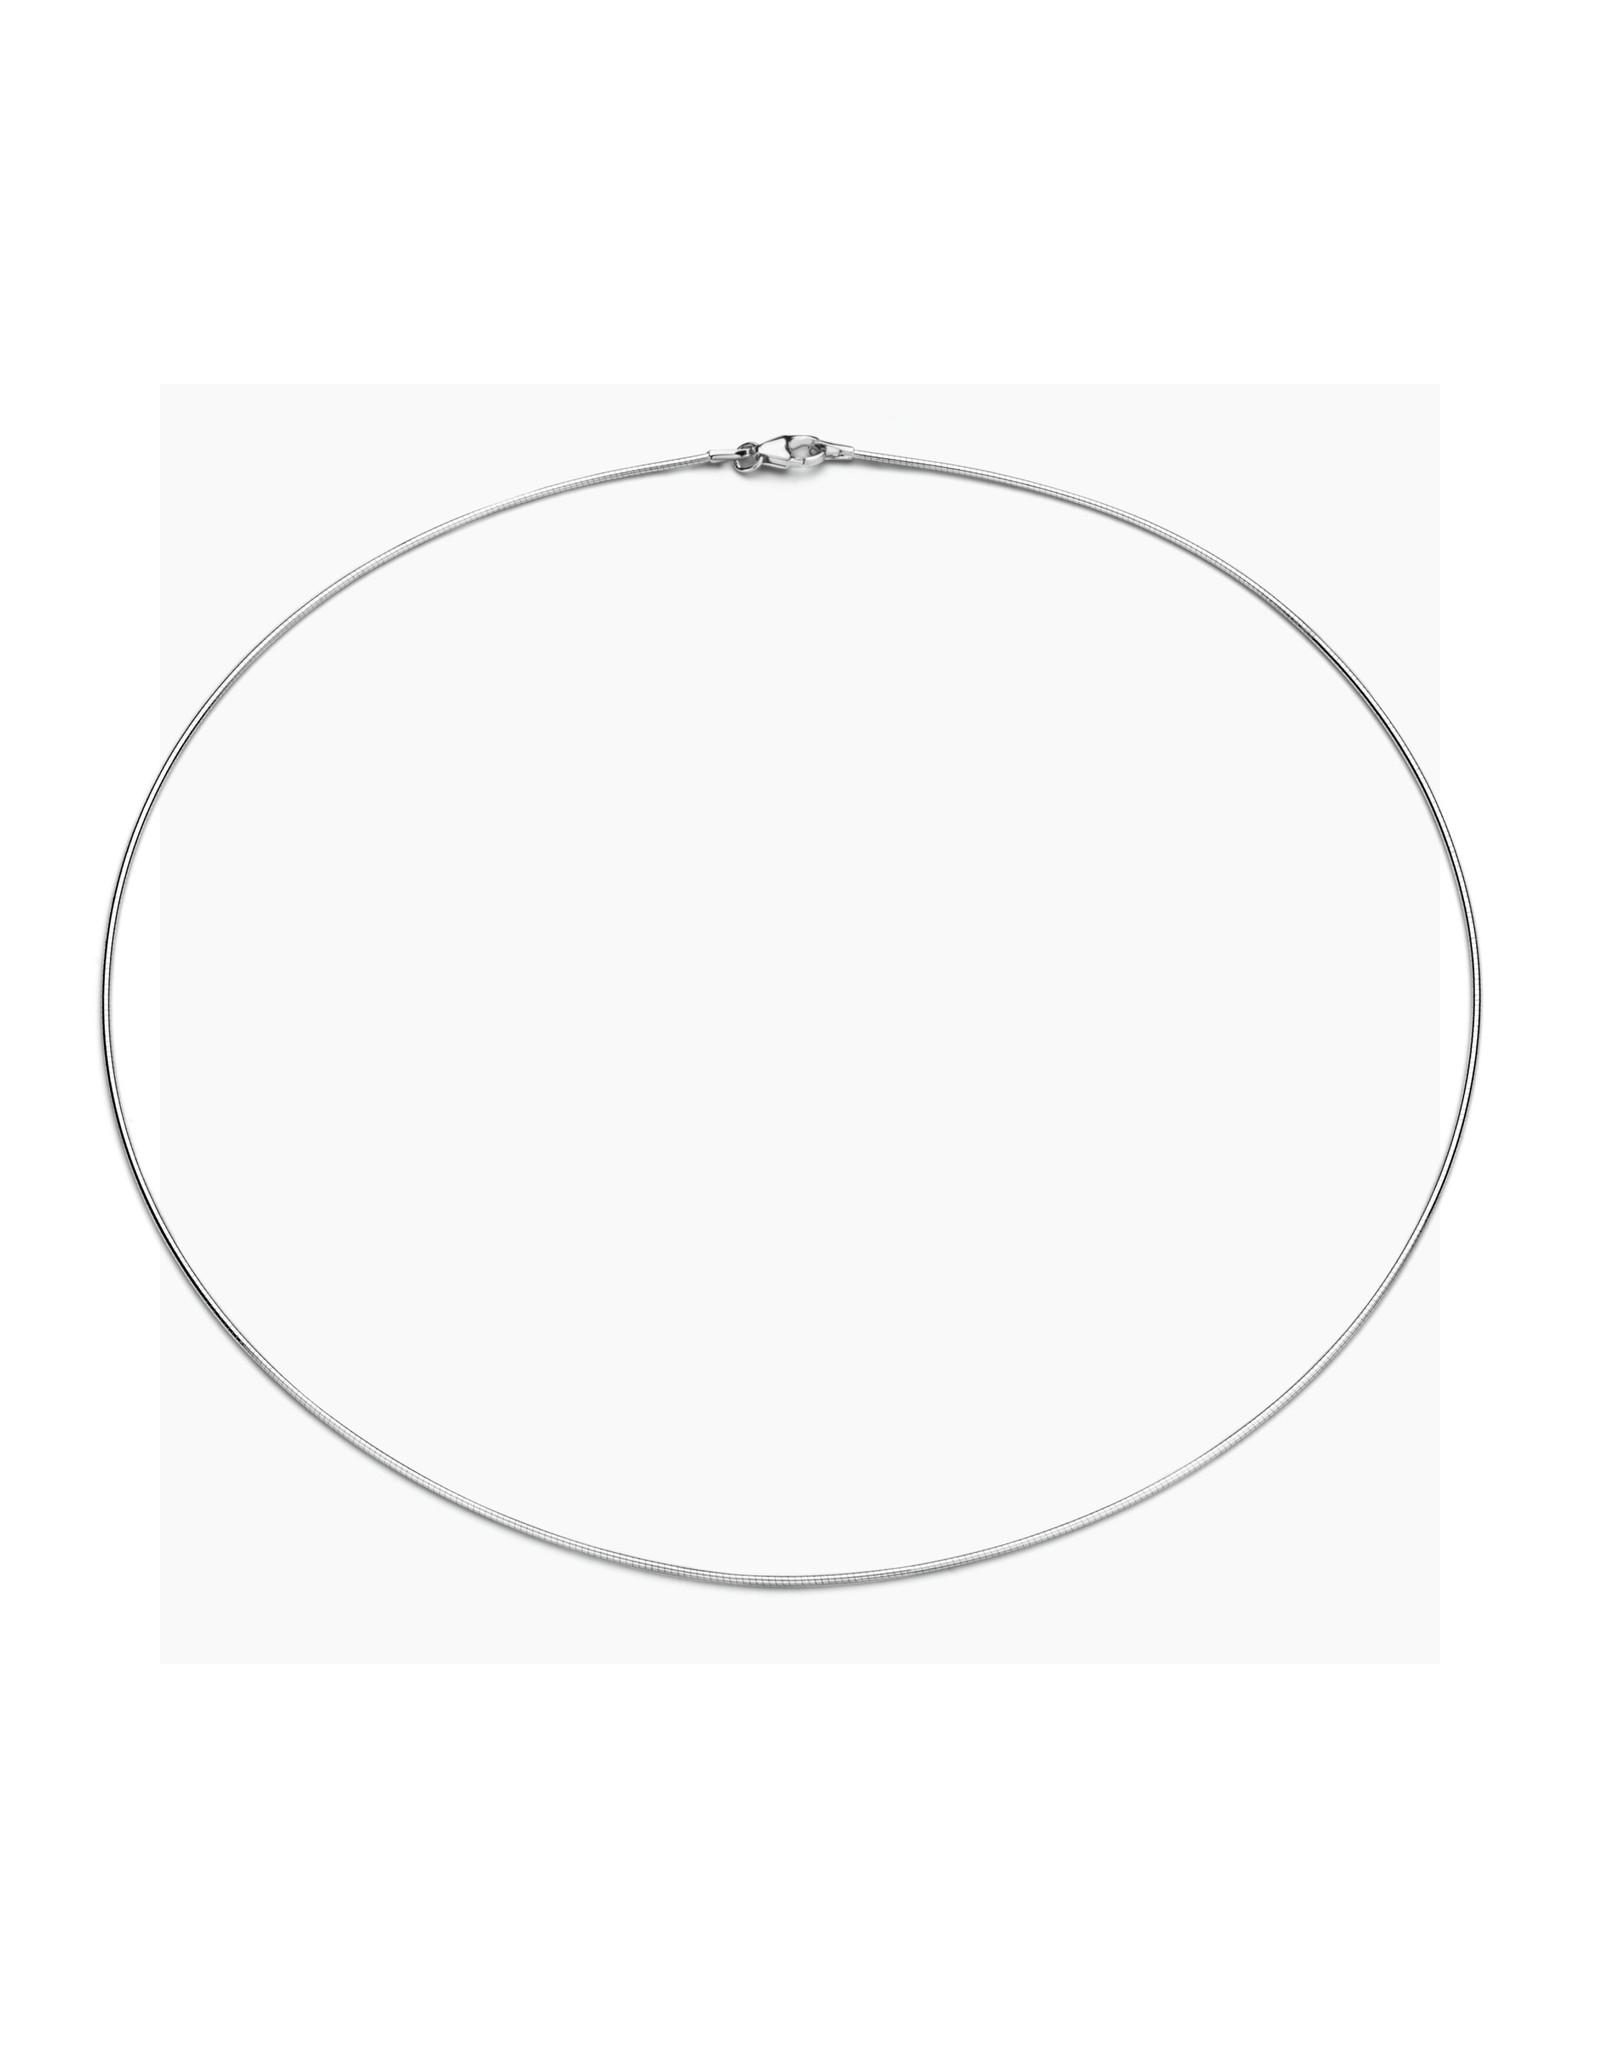 FJF Jewellery Collier FJF Tonda zilver FJF0020142SRH